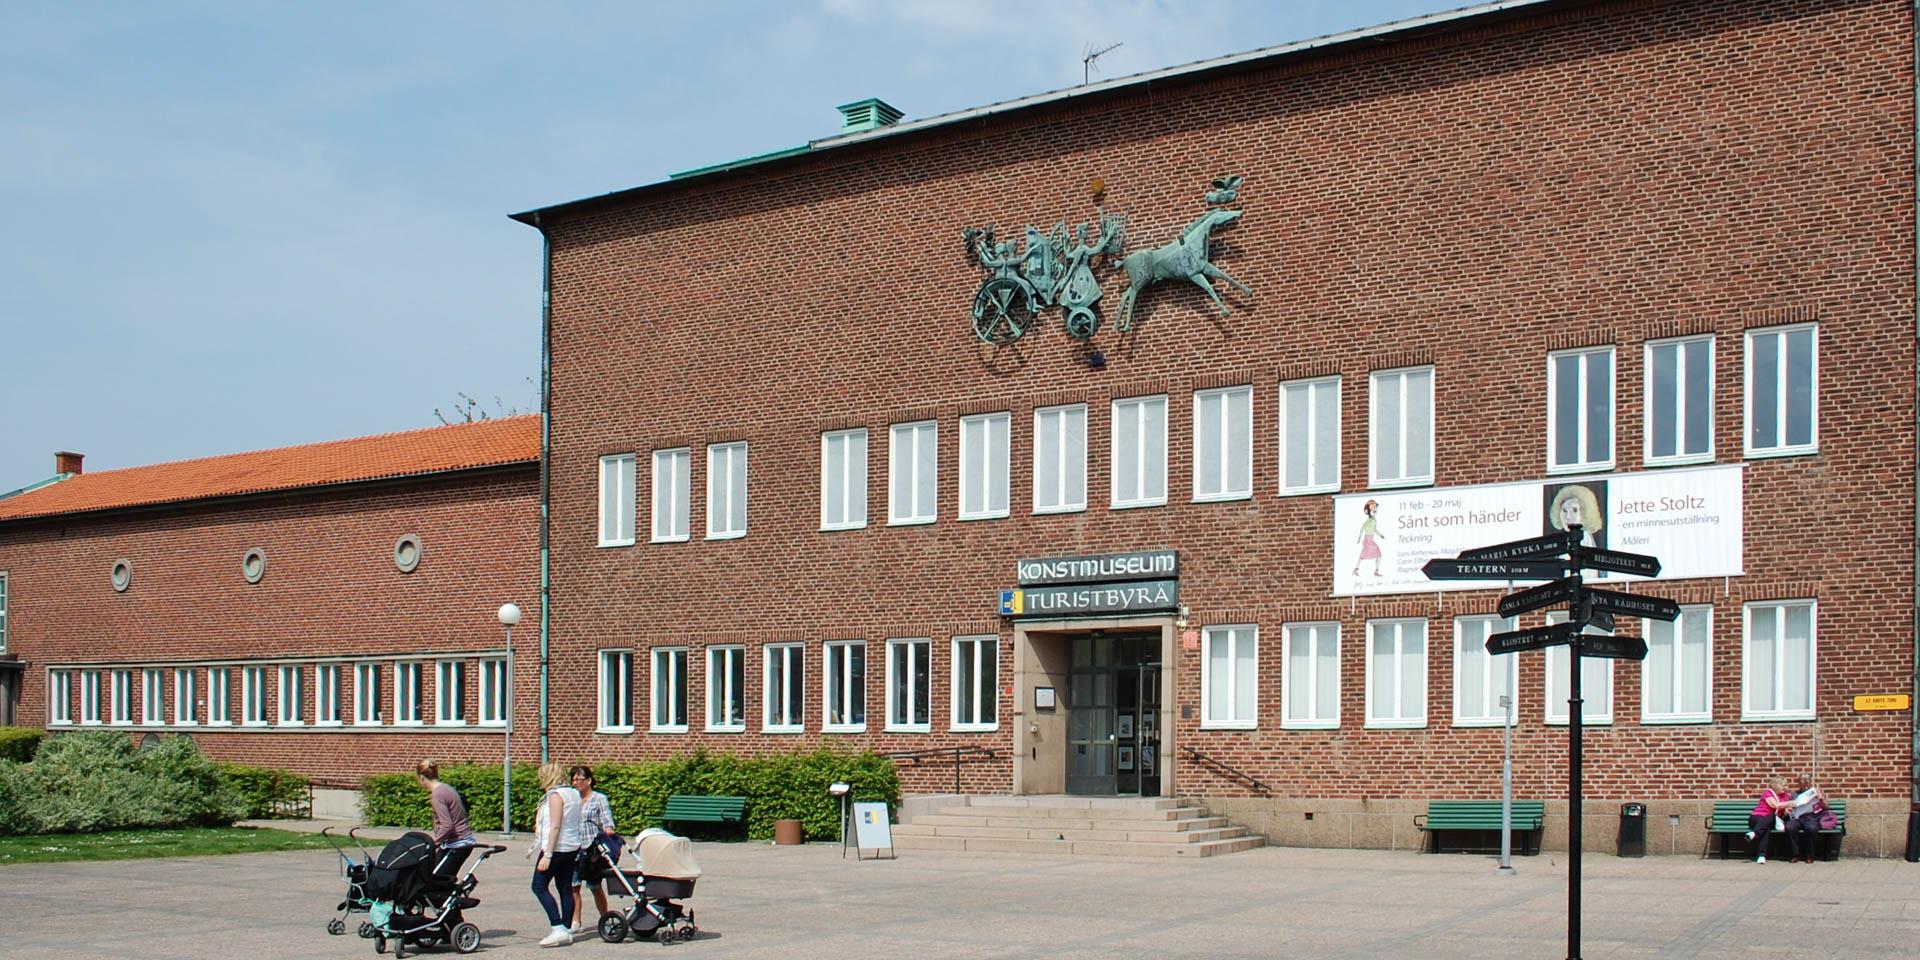 Ystads Konstmuseum 2012